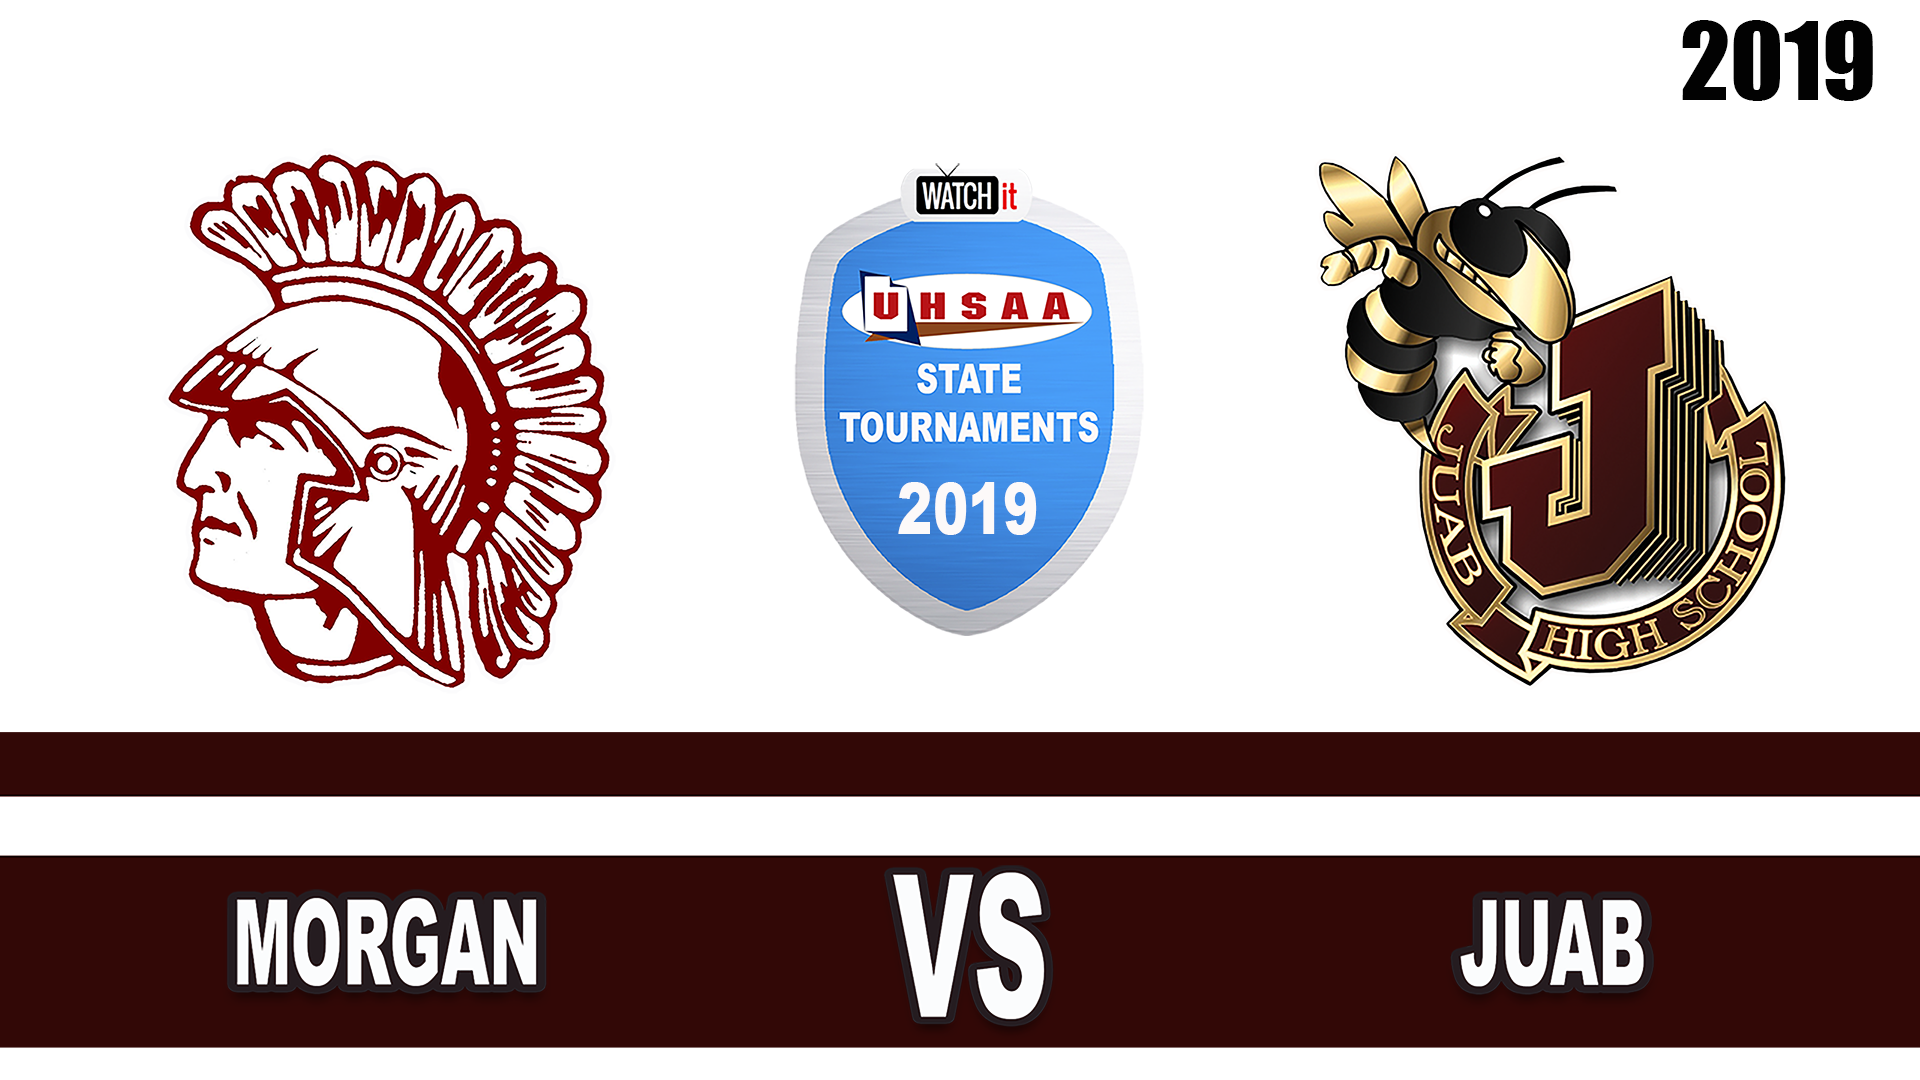 Morgan vs Juab